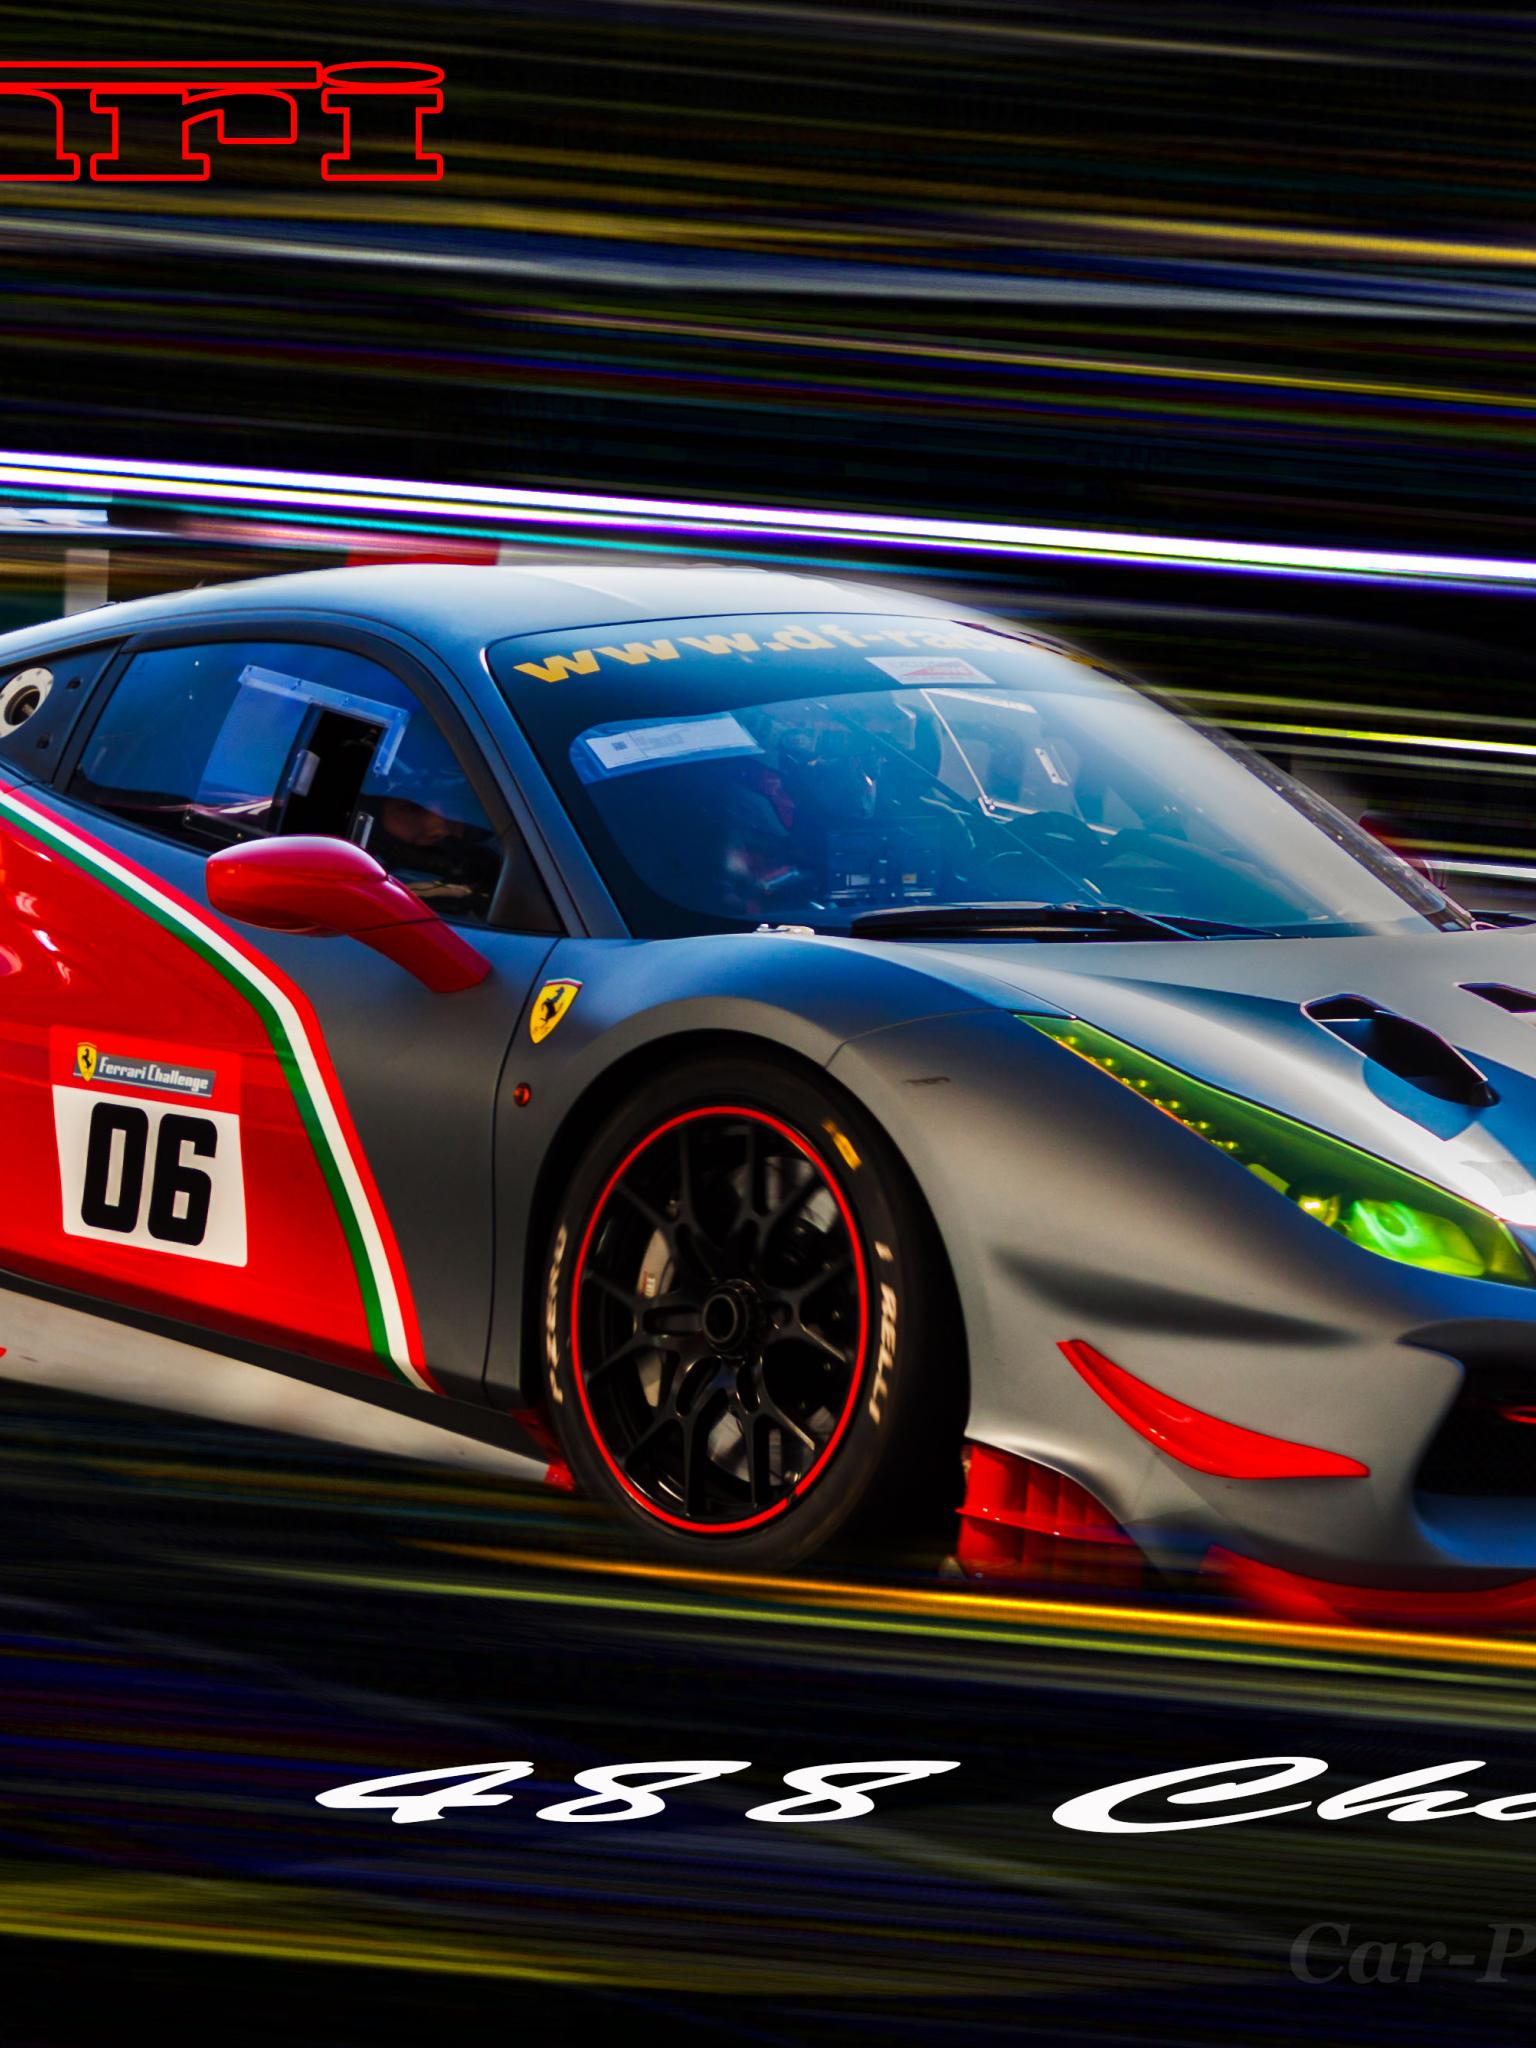 Free Download Ferrari Cars Wallpapers 4k Ultra Hd Desktop